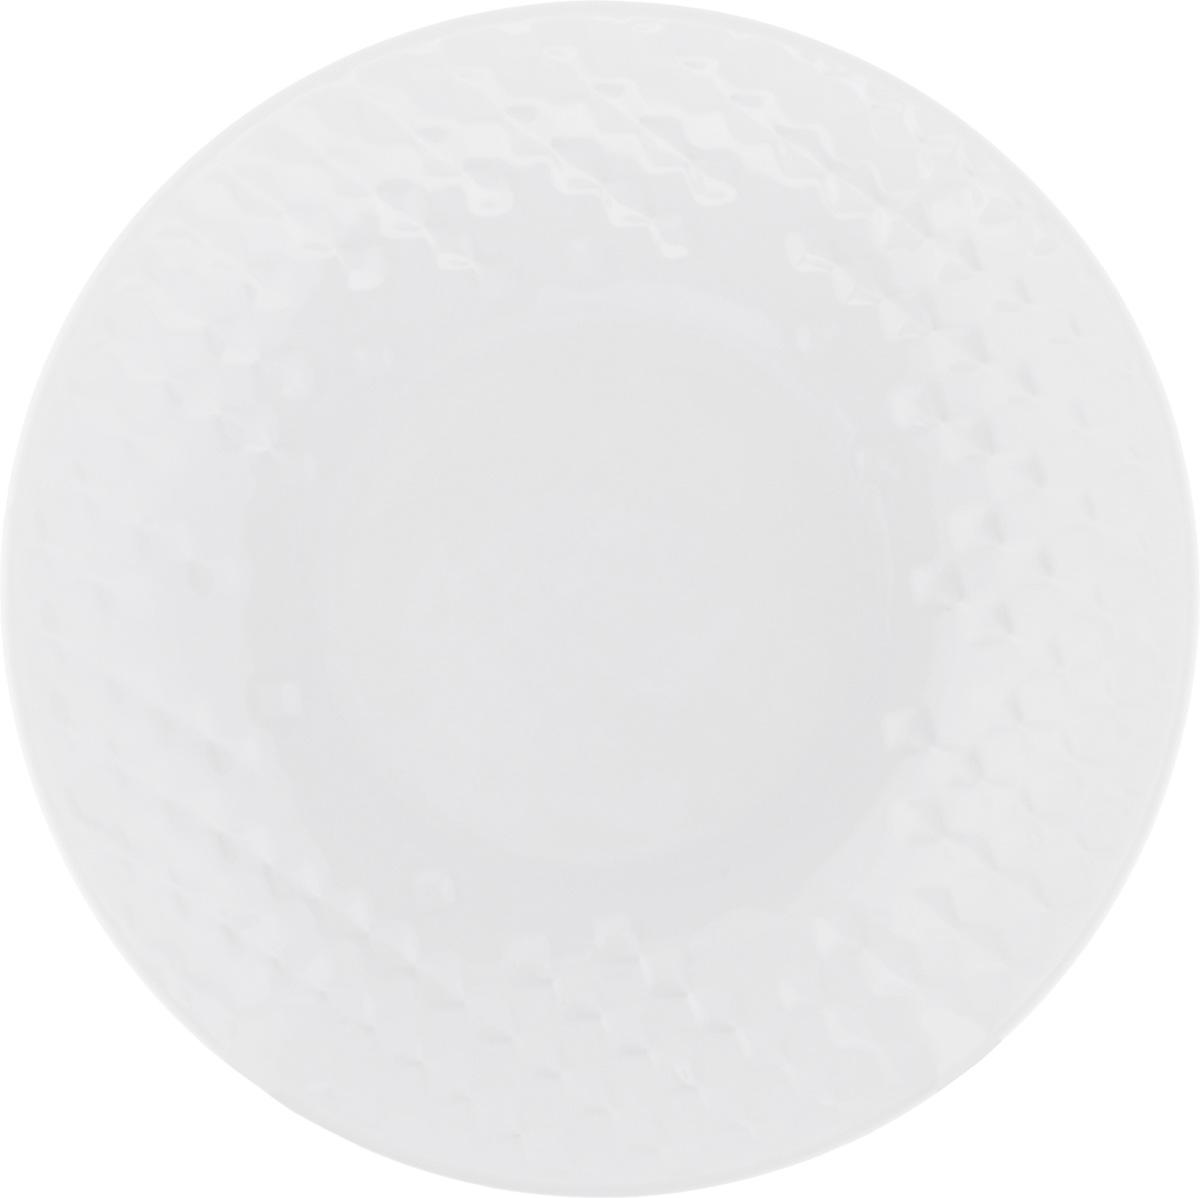 "Тарелка суповая Walmer ""Sapphire"", цвет: белый, диаметр 21 см"